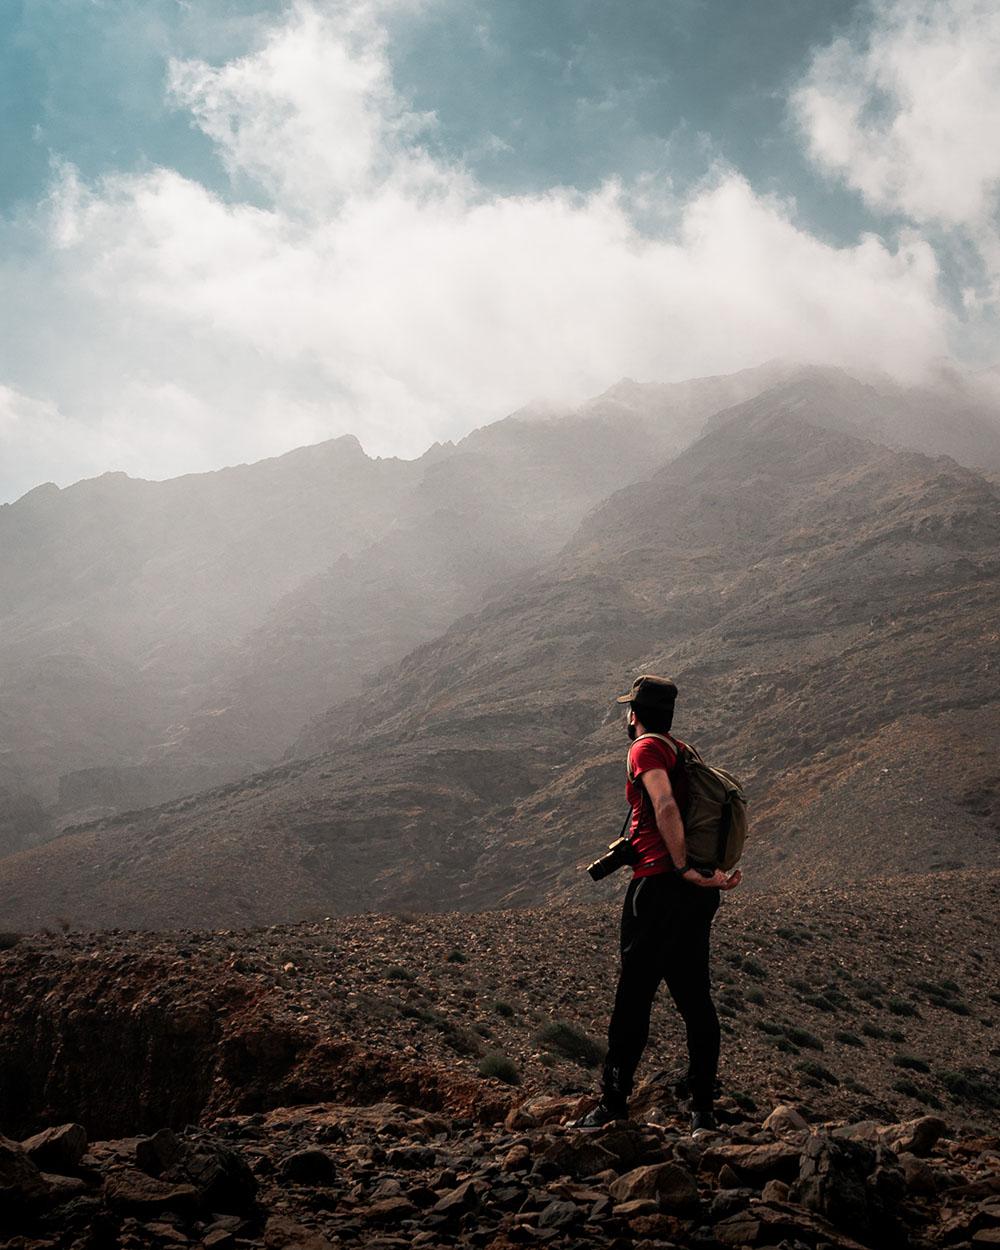 Exploring Oman's mountain ranges.